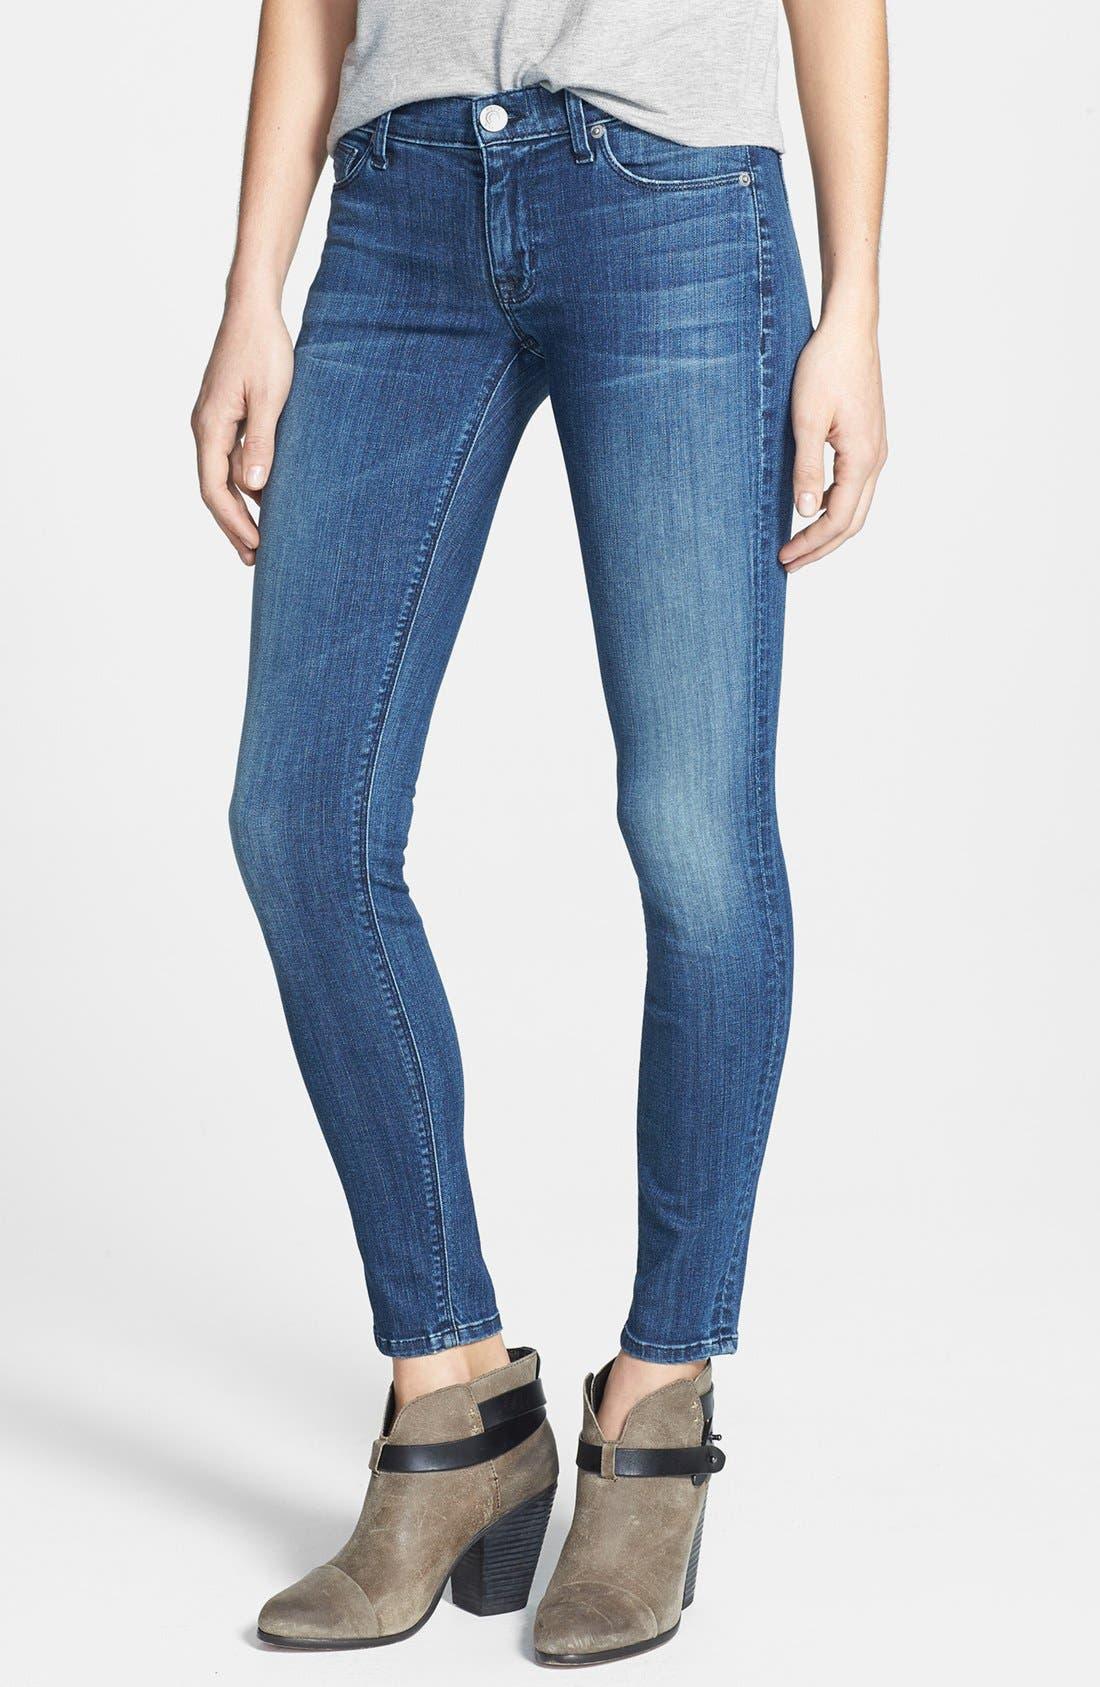 Main Image - Hudson Jeans 'Krista' Super Skinny Jeans (Supervixen)